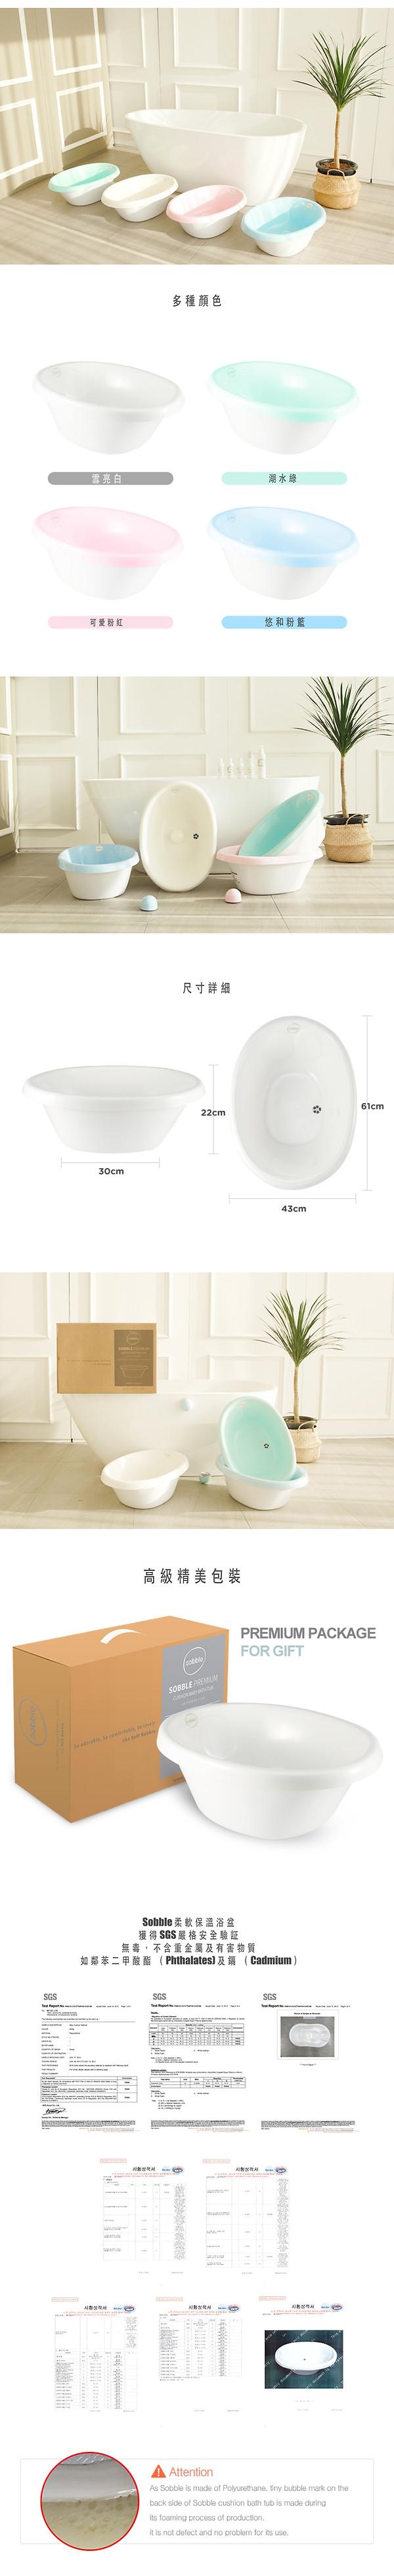 Sobble - Cushion Bathtub